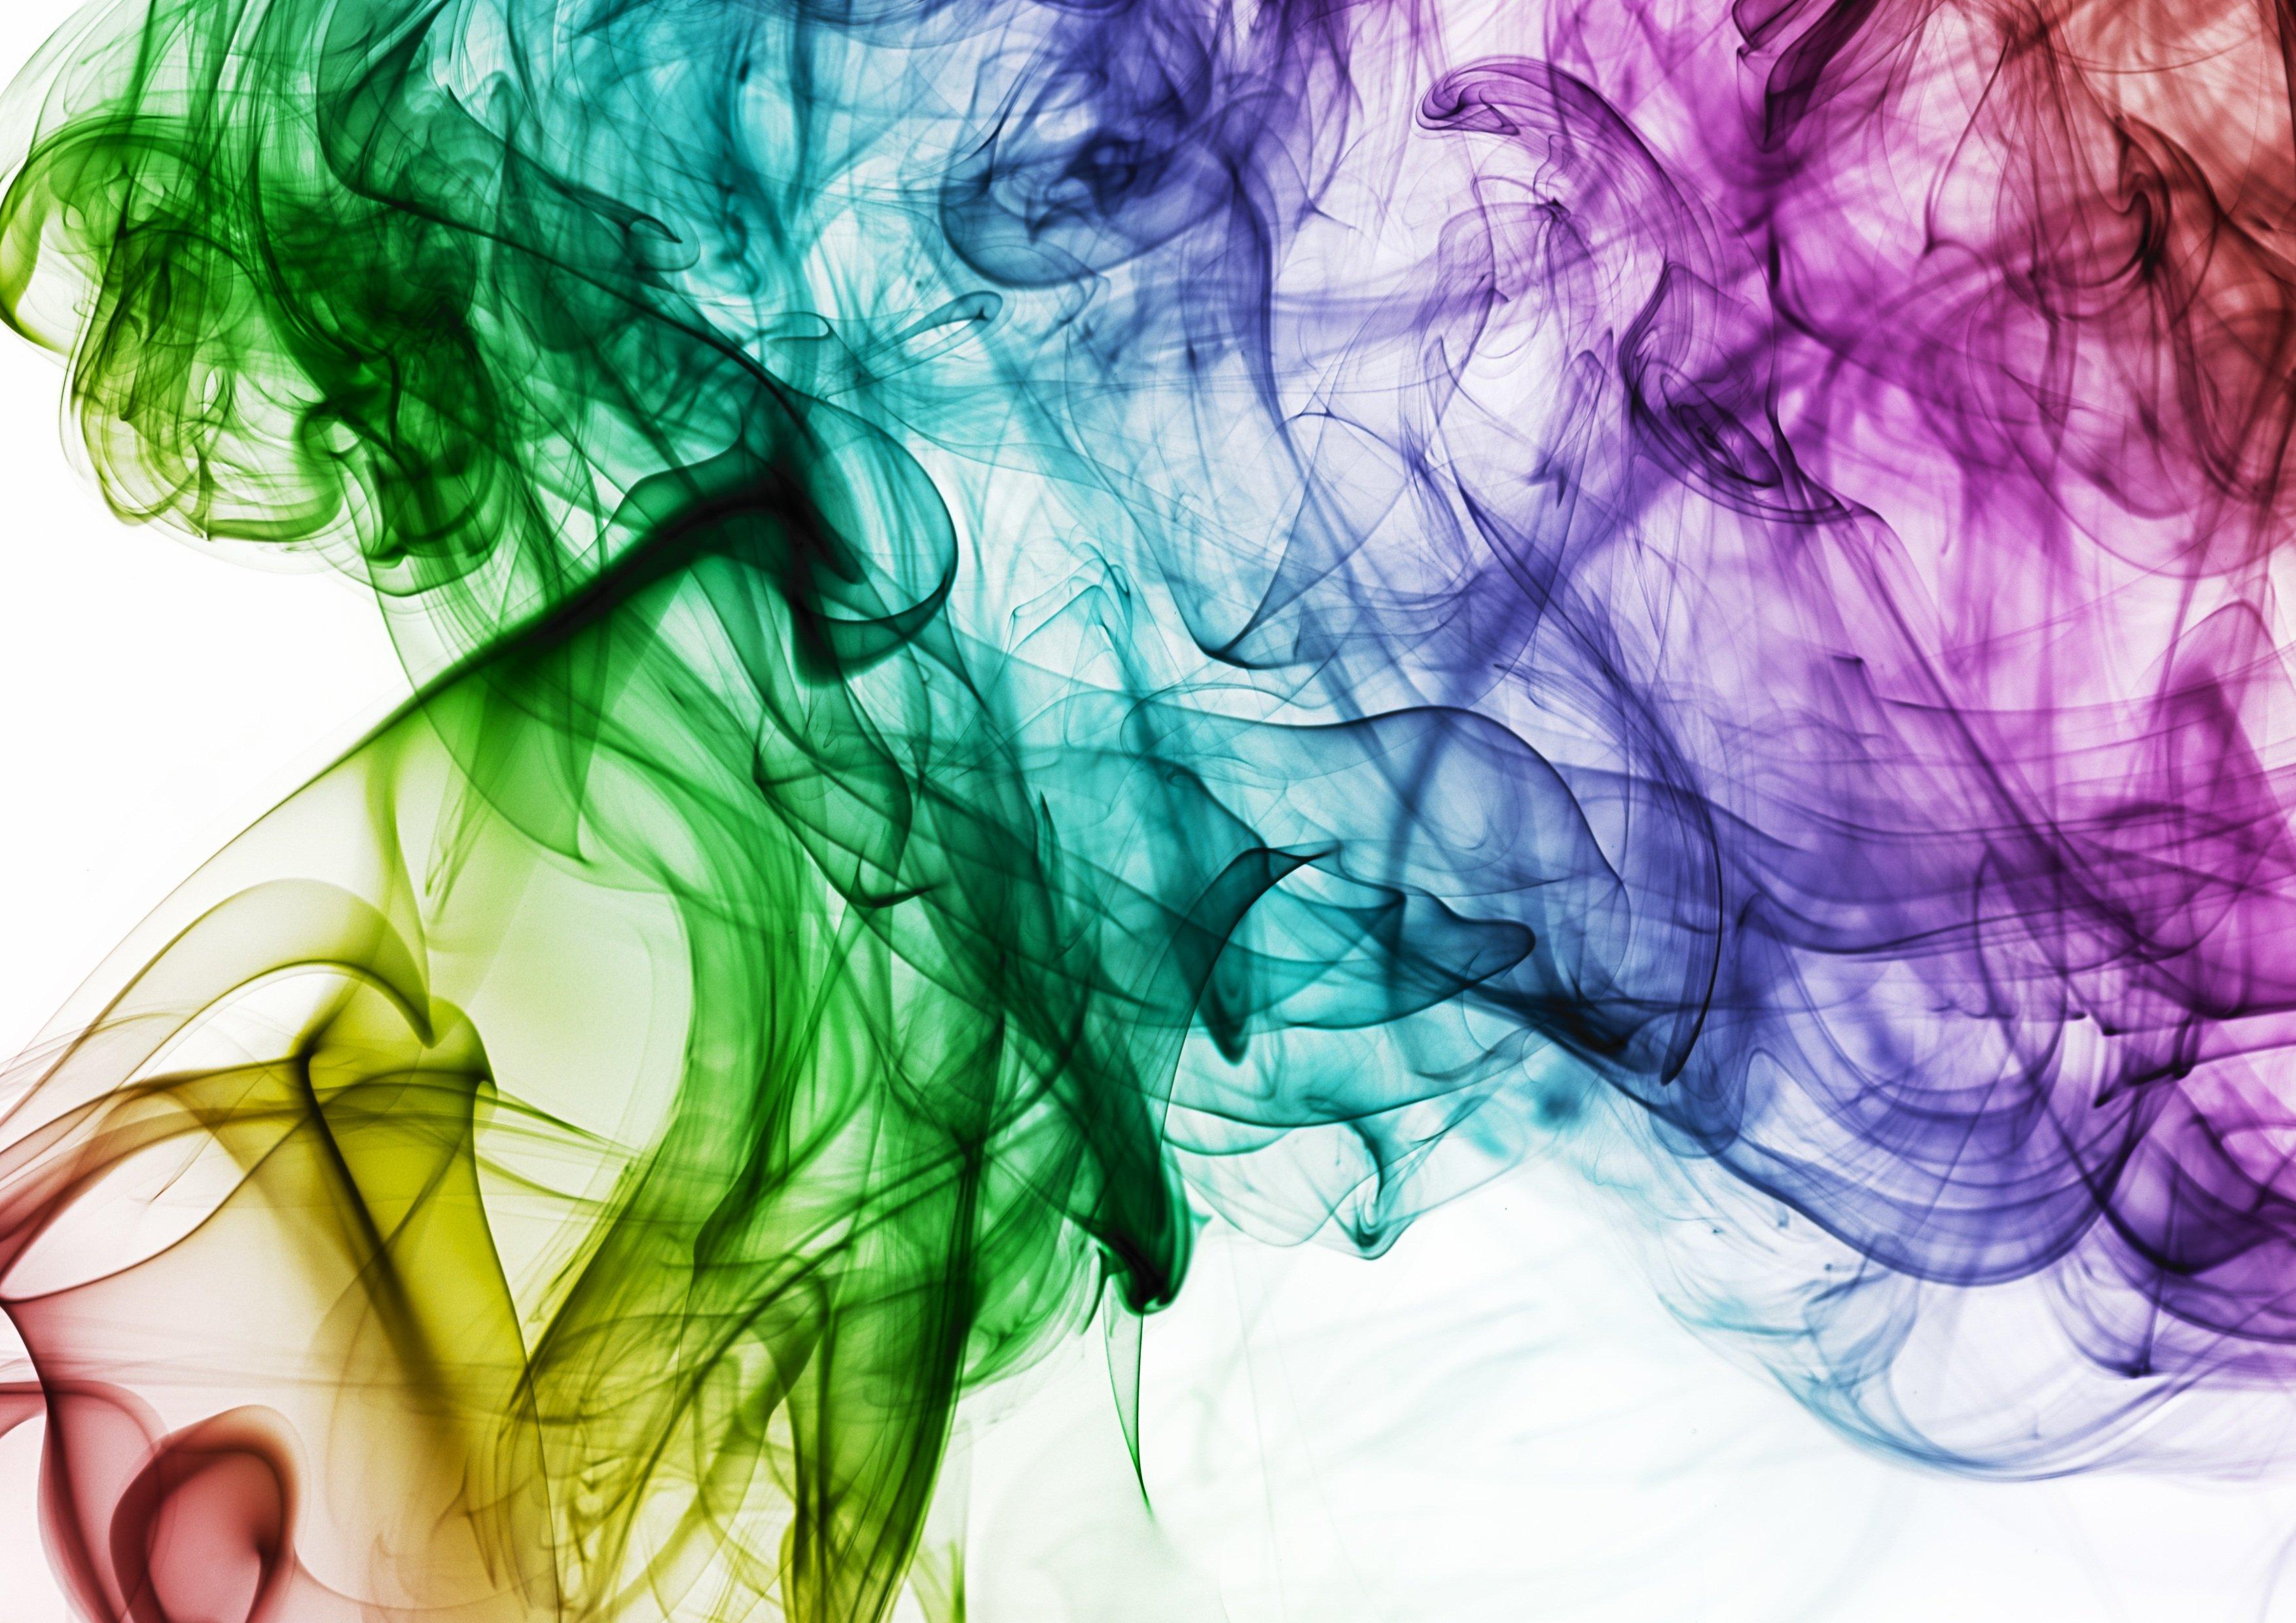 Farbenspiel Rauch farbig Florence Zumbihl